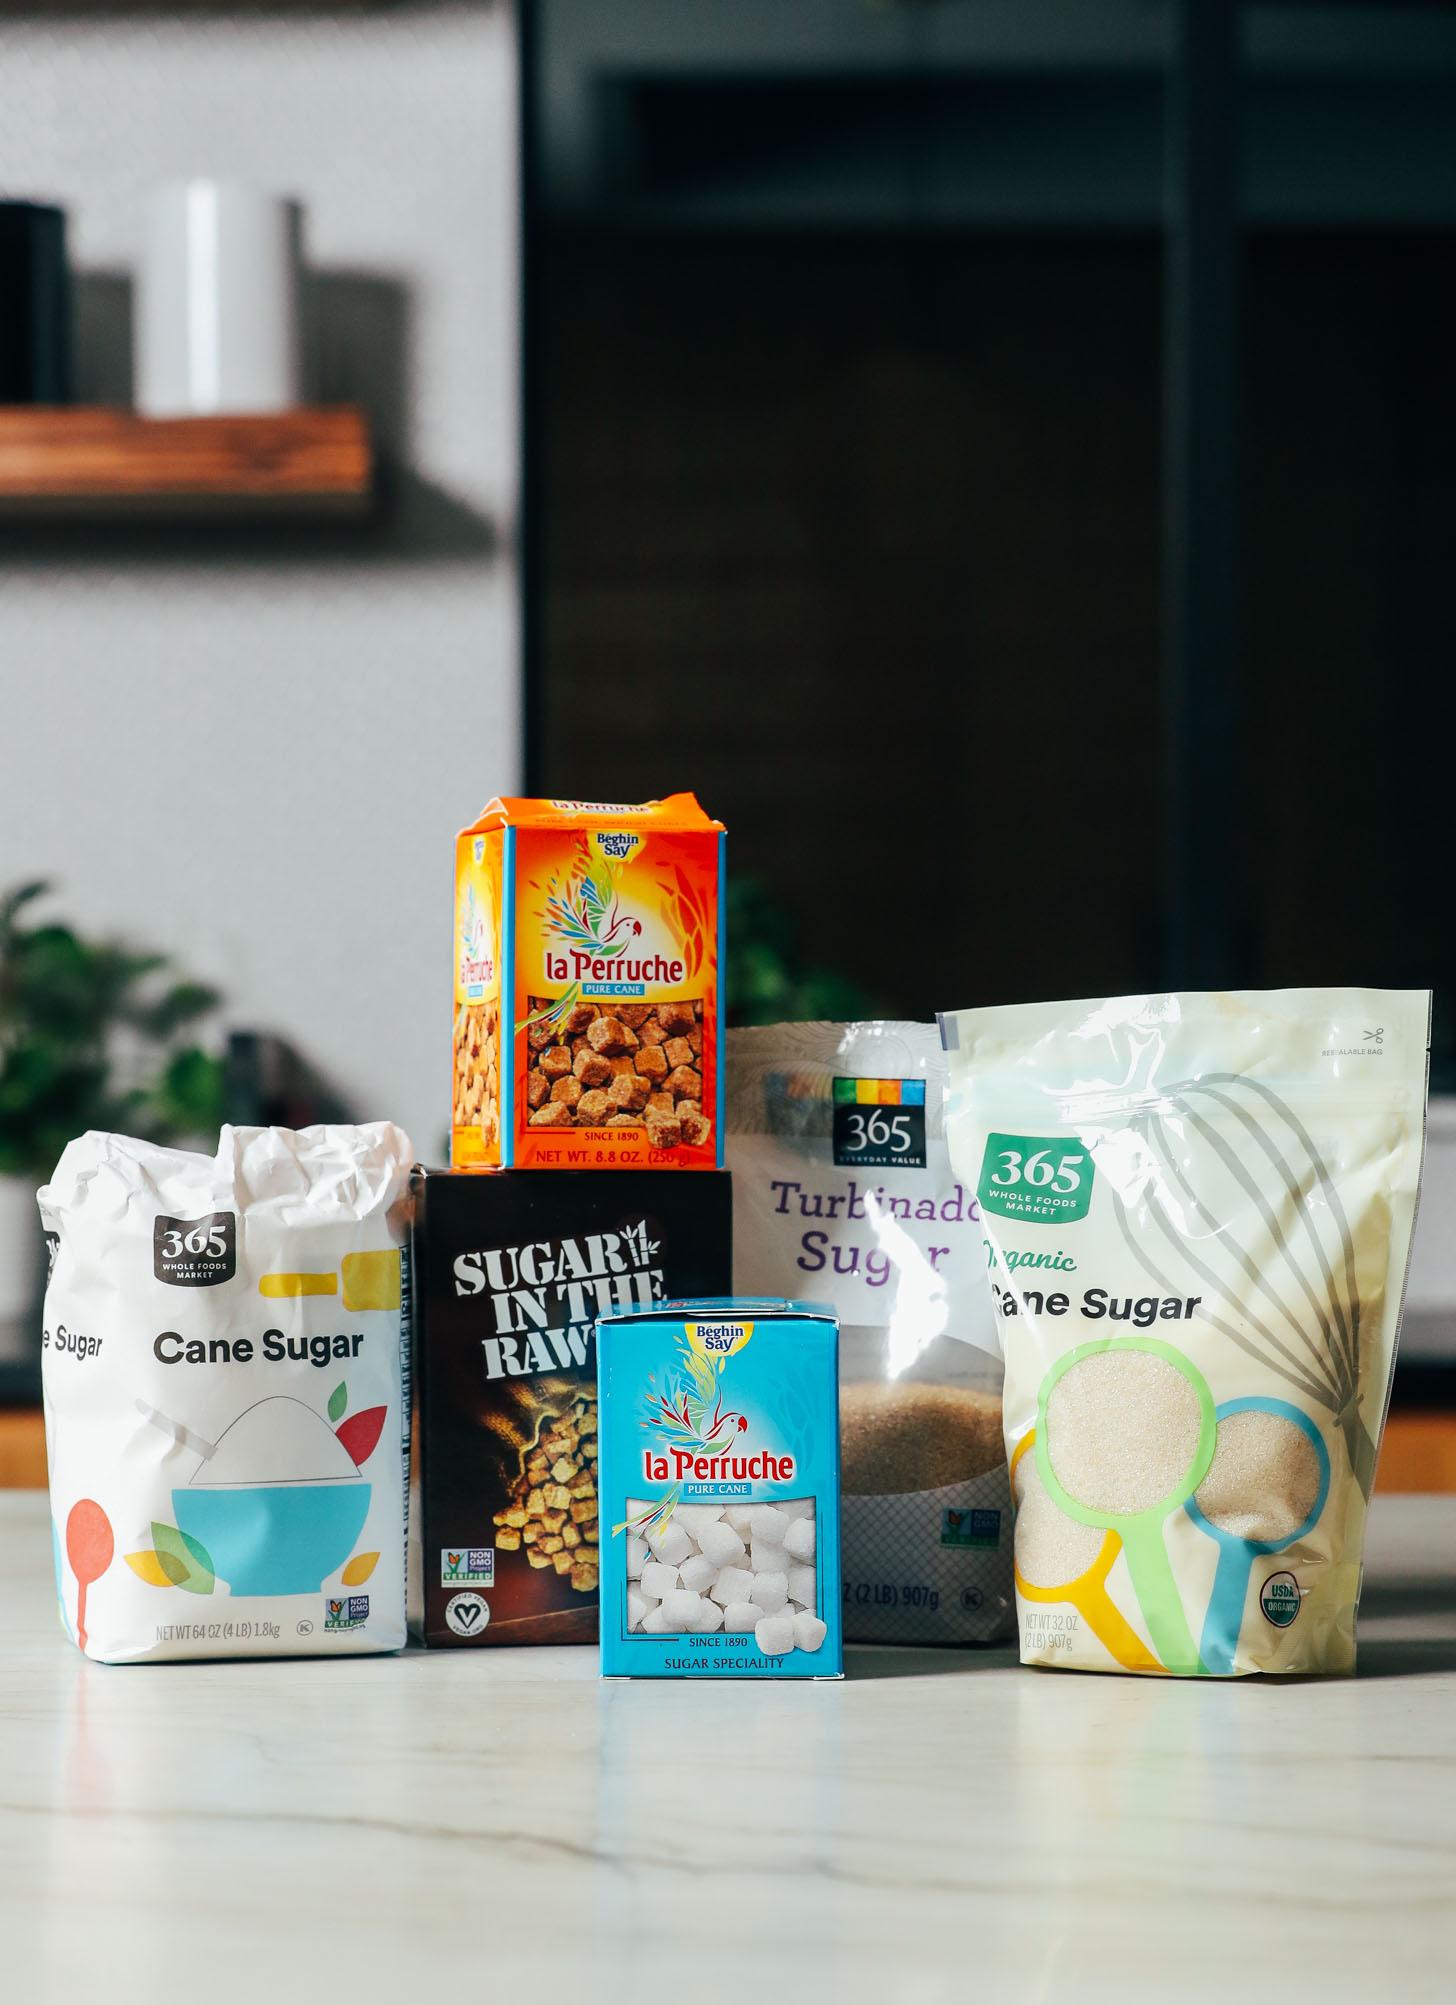 Cane sugar, turbinado sugar, sugar cubes, and more sugars for making cocktails